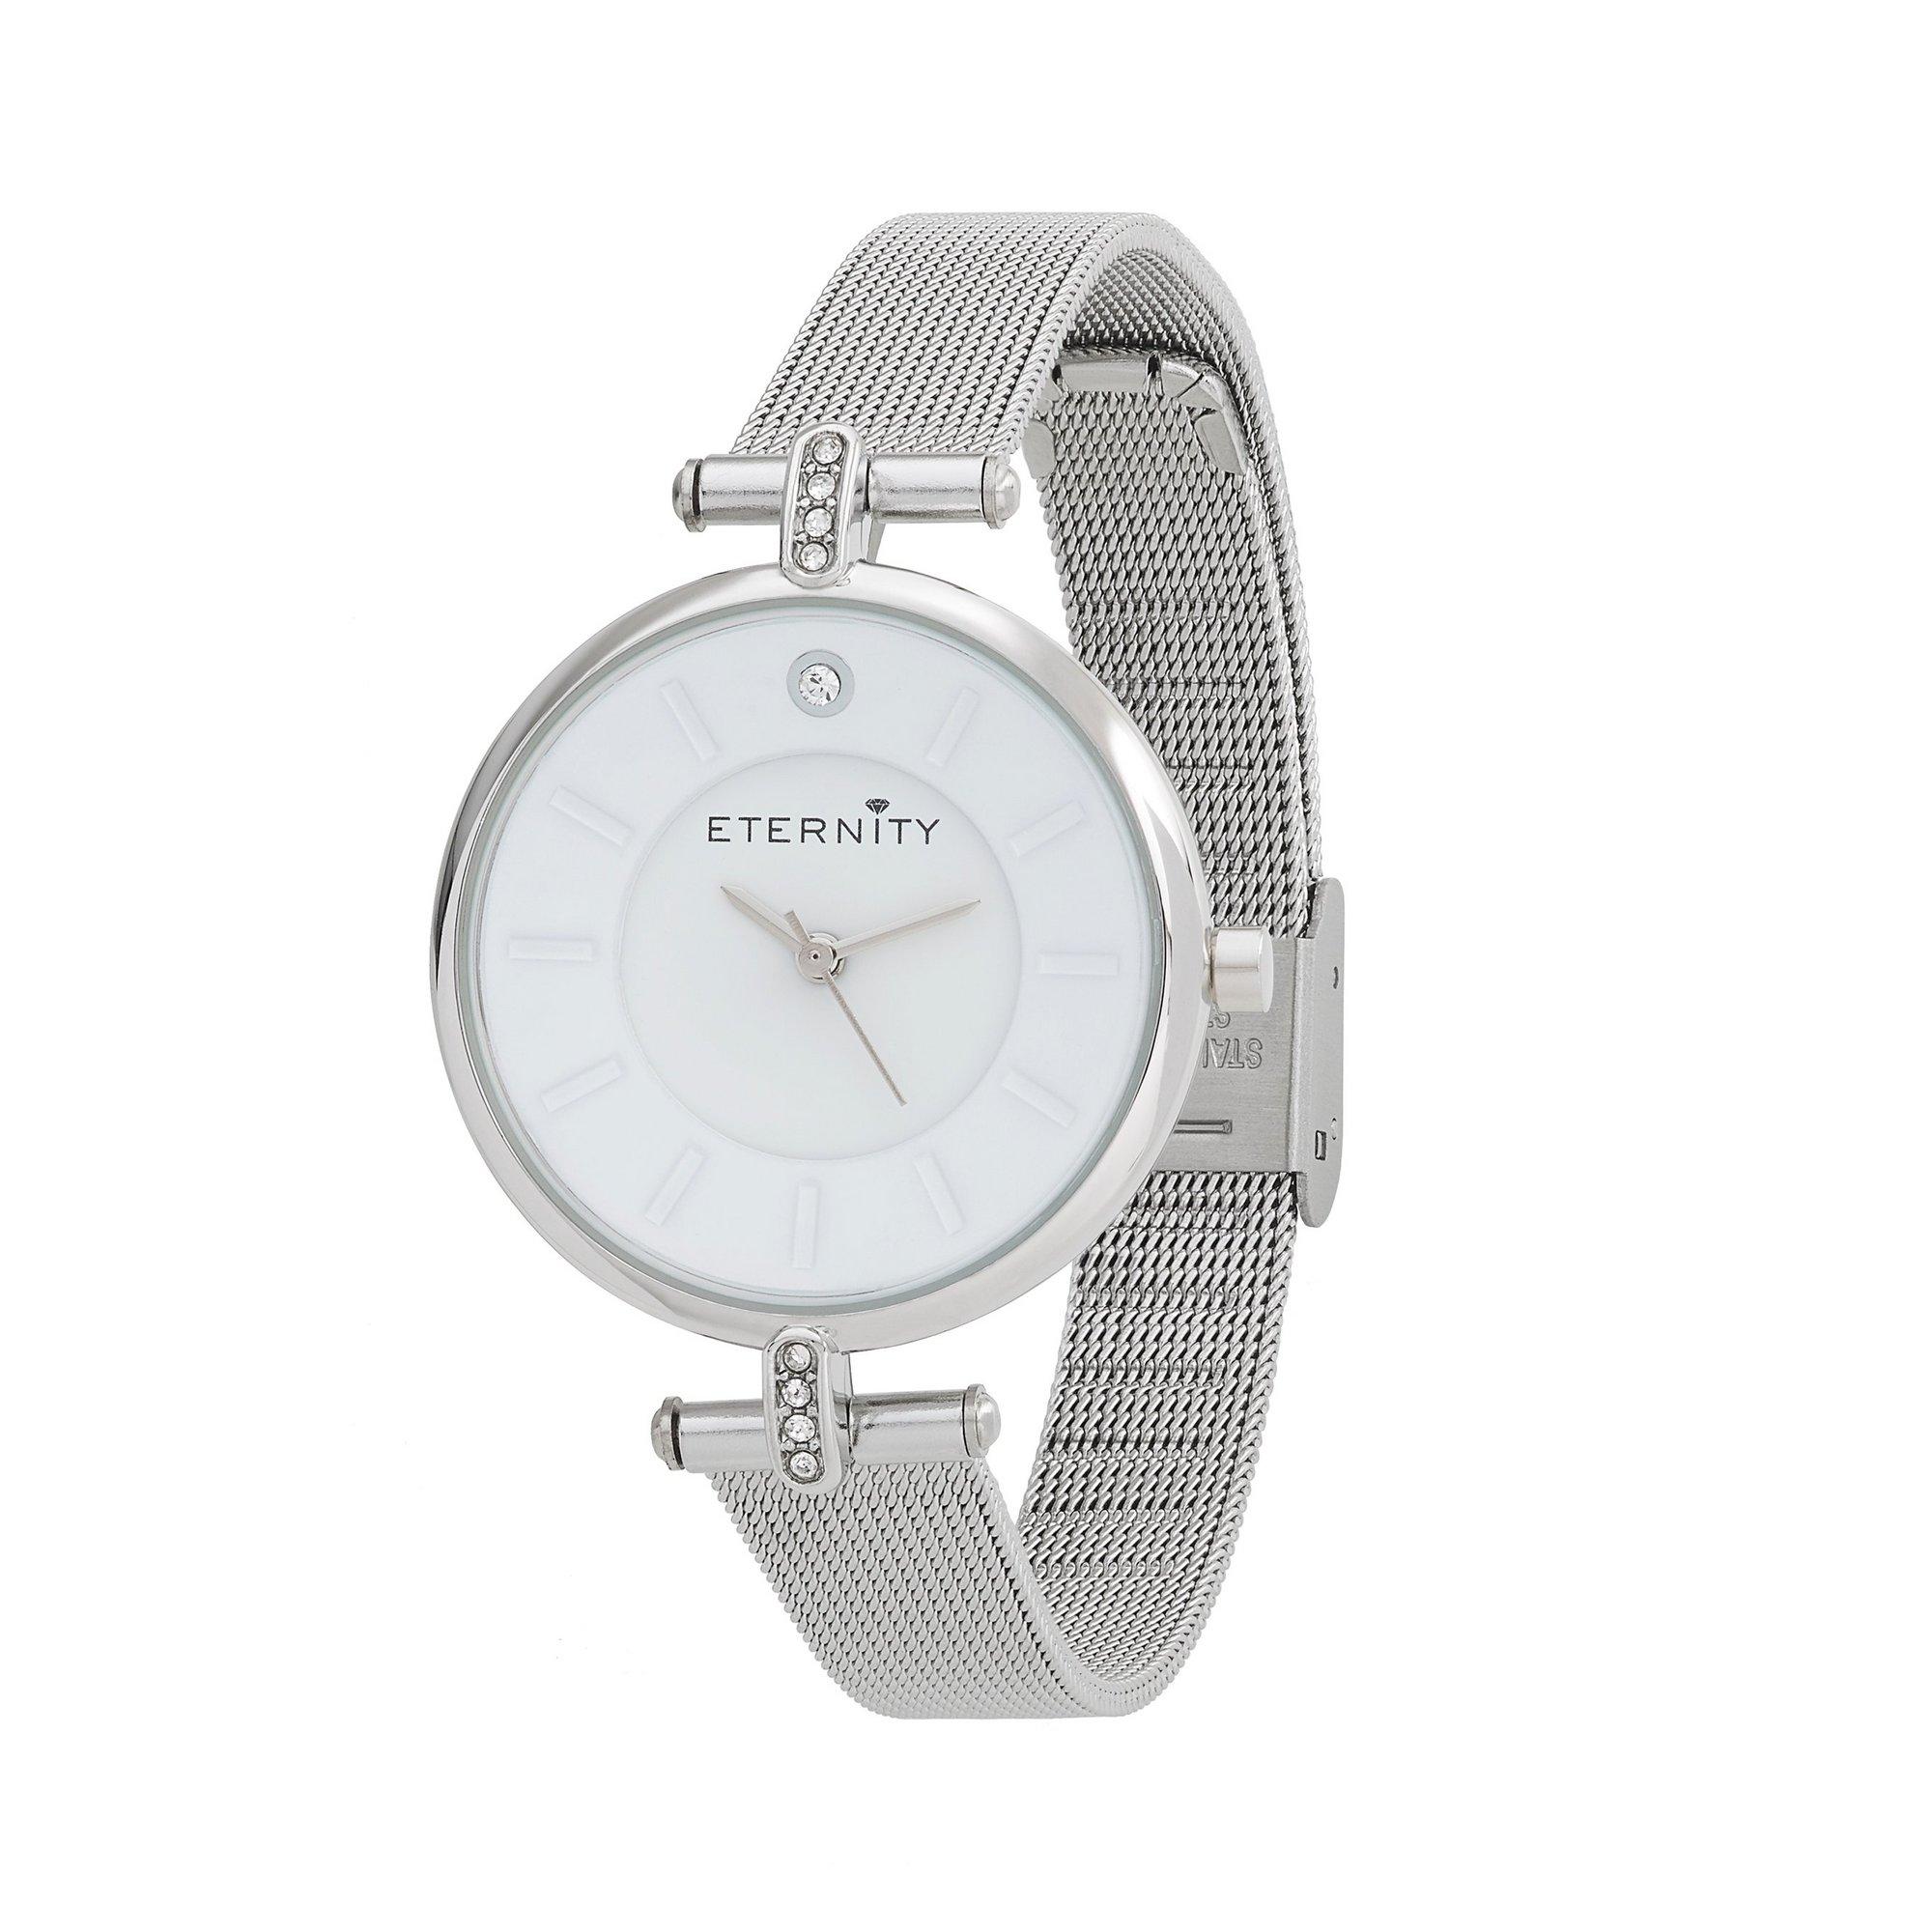 Image of Eternity Ladies Silver Tone Mesh Strap Watch